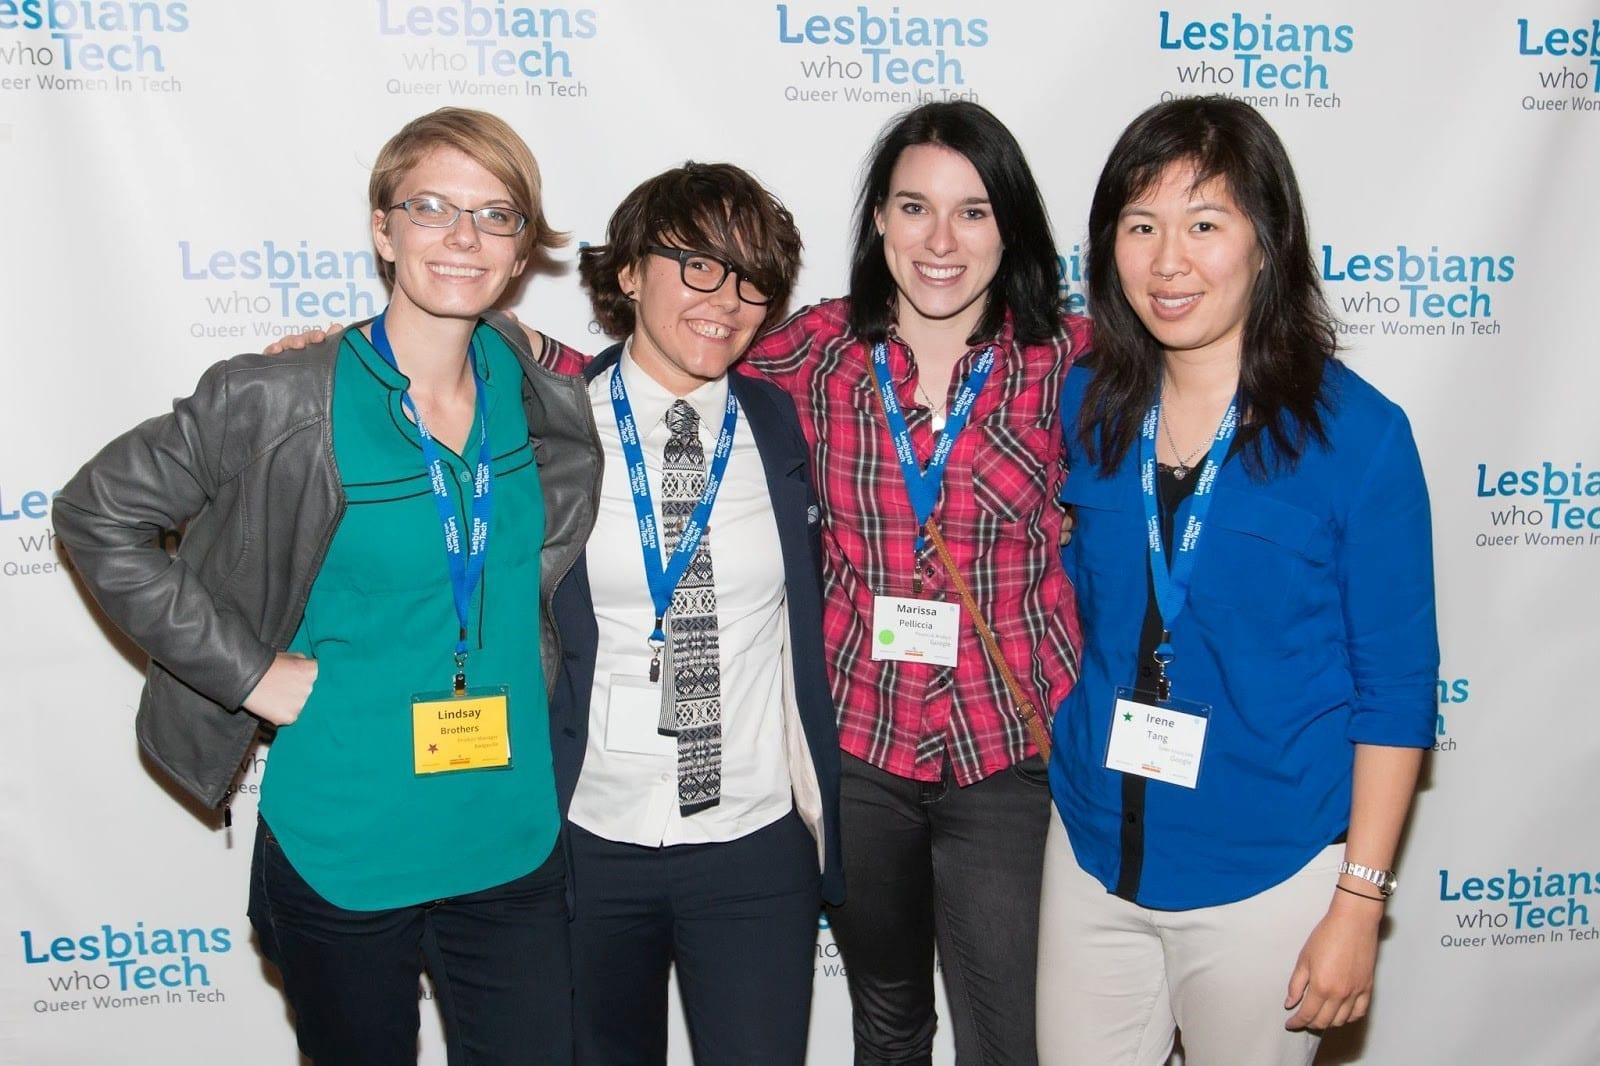 best-online-dating-sites-for-lesbians